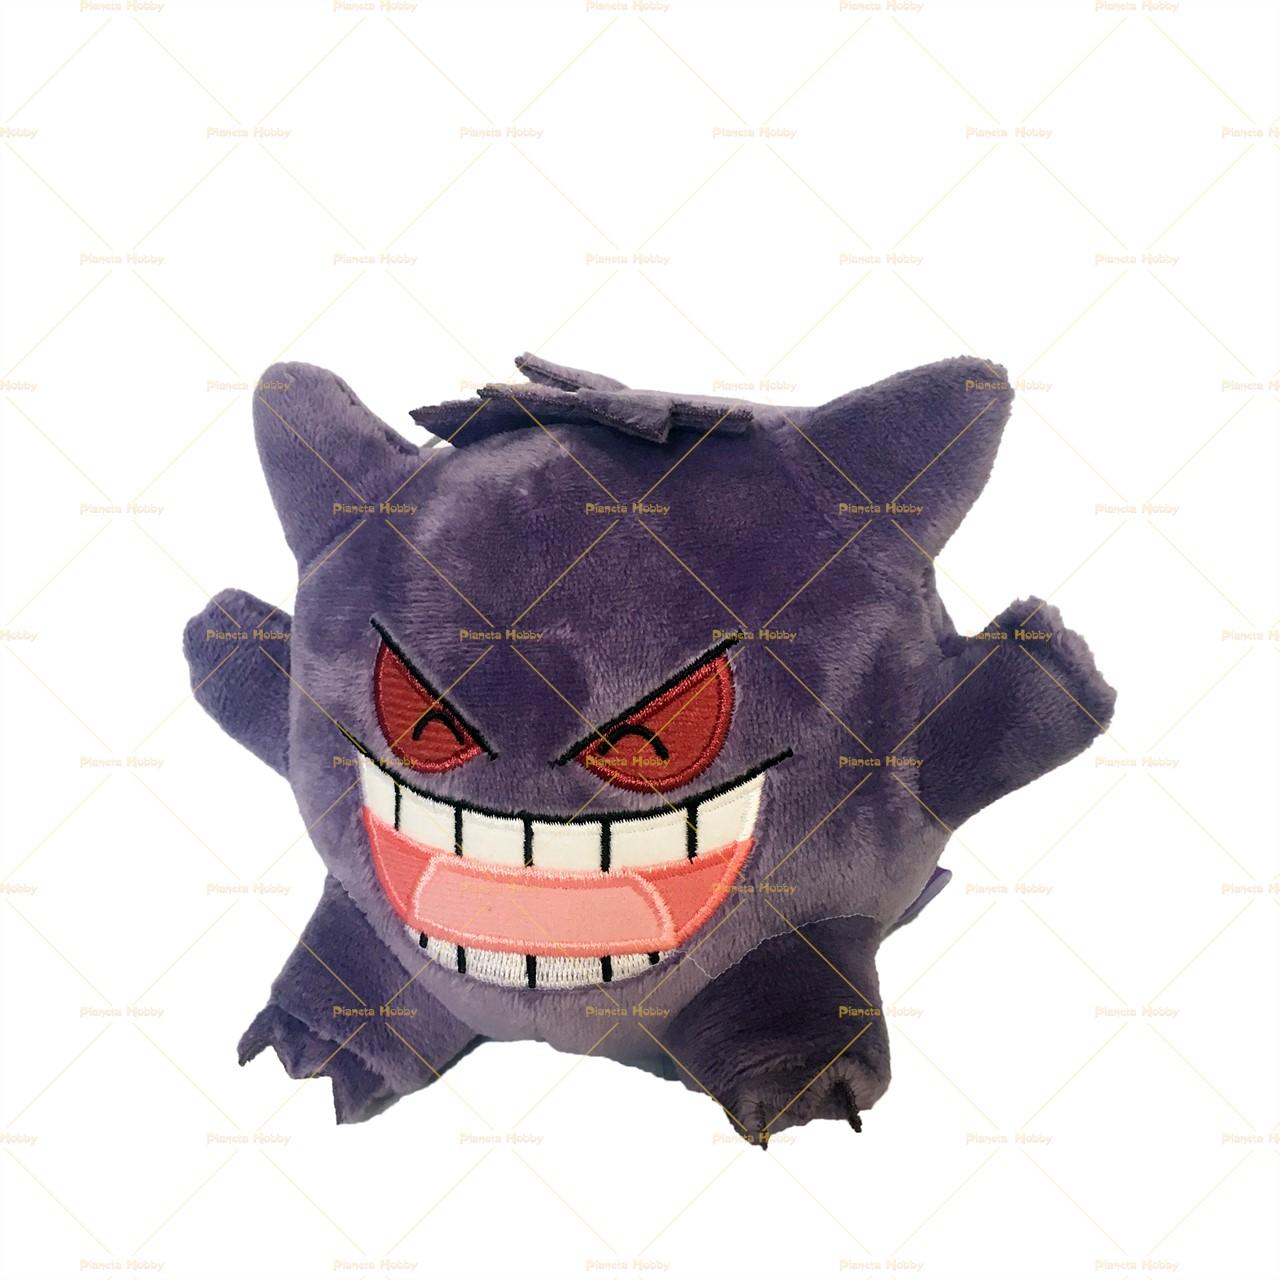 Pokemon Peluche Gengar Occhi Chiusi 24 cm I love Gengar ORIGINALE Banpresto